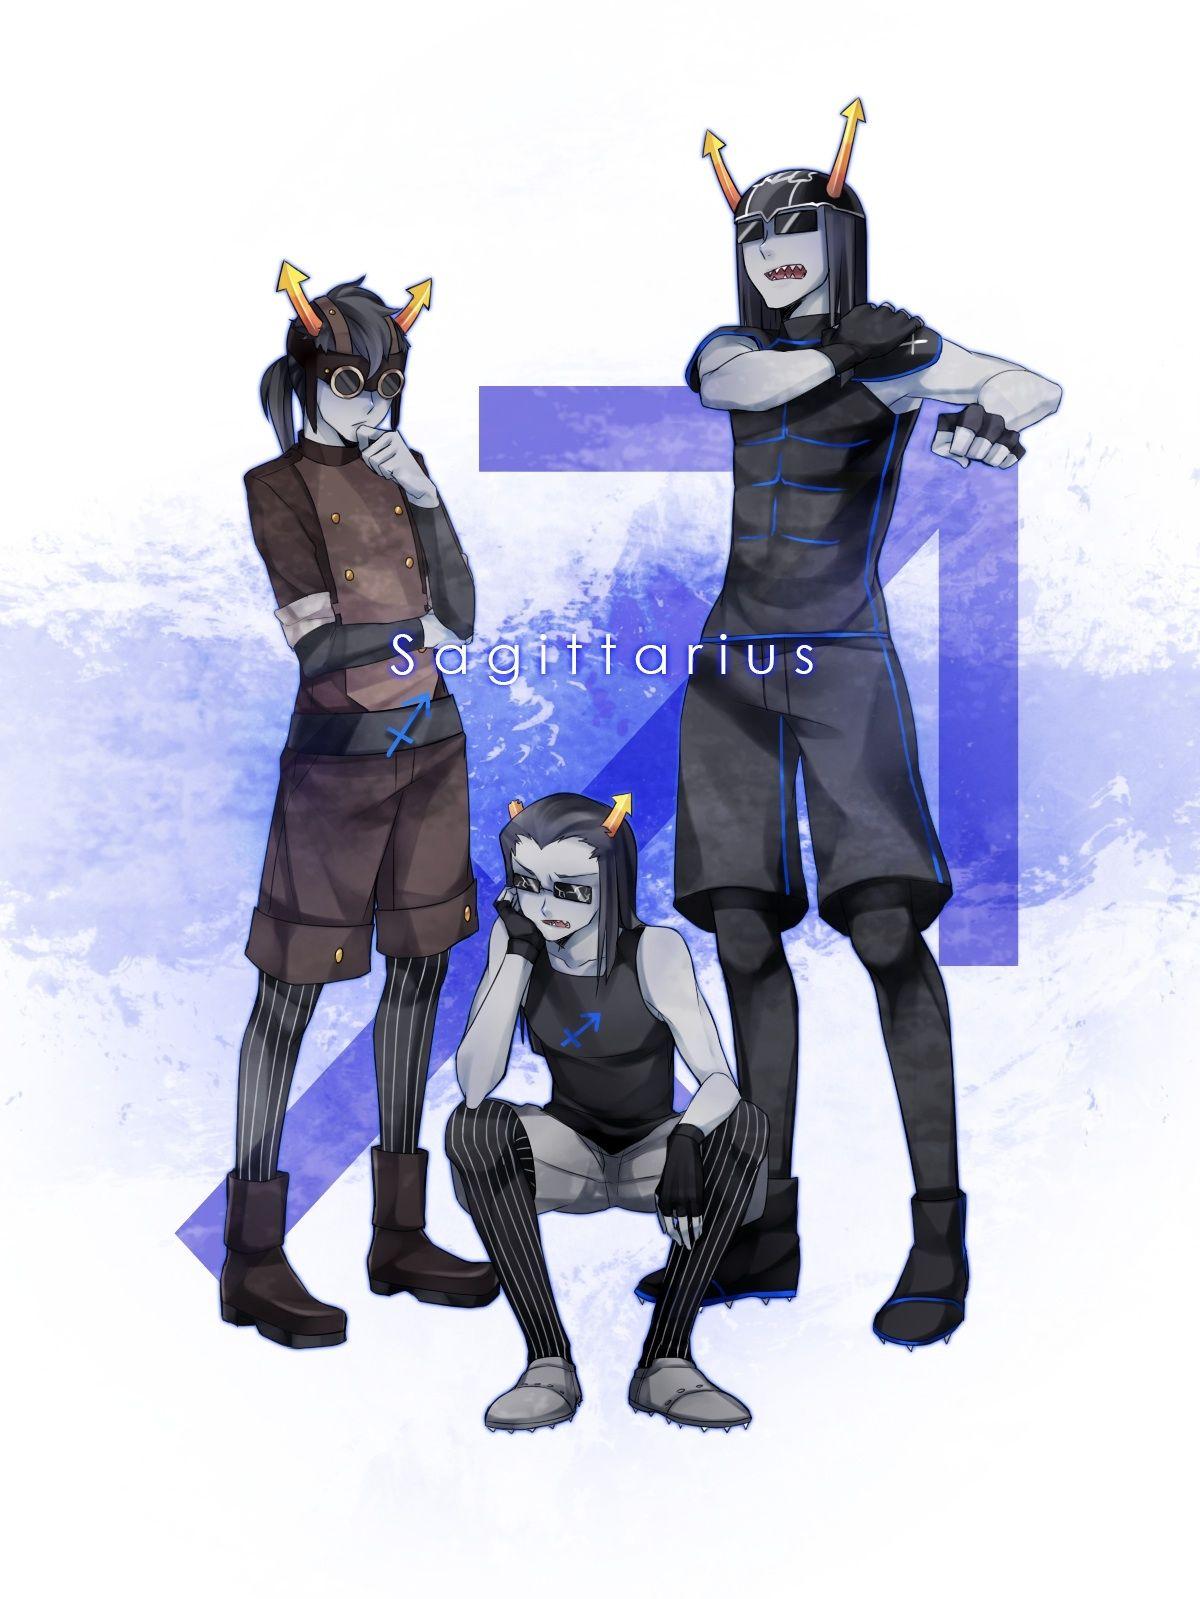 Sagittarius- From left to right: Horuss Zahhak, Equius Zahhak and E on